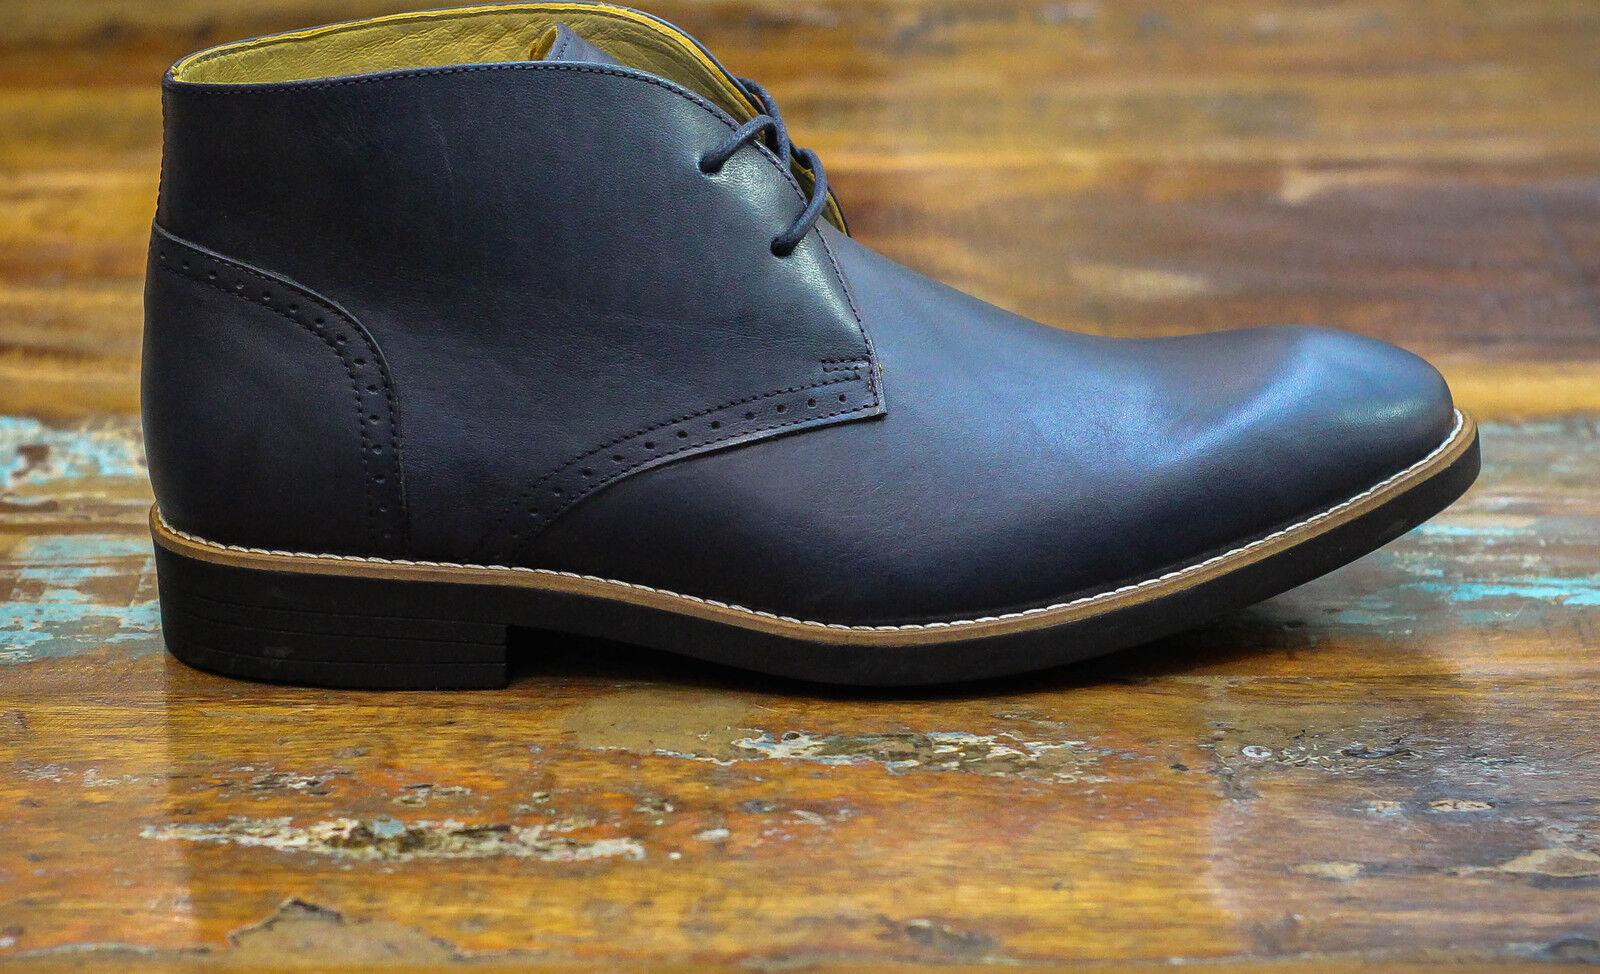 Steptronic Navy bluee Calf Leather Chukka Desert Comfort Boots Sheepskin